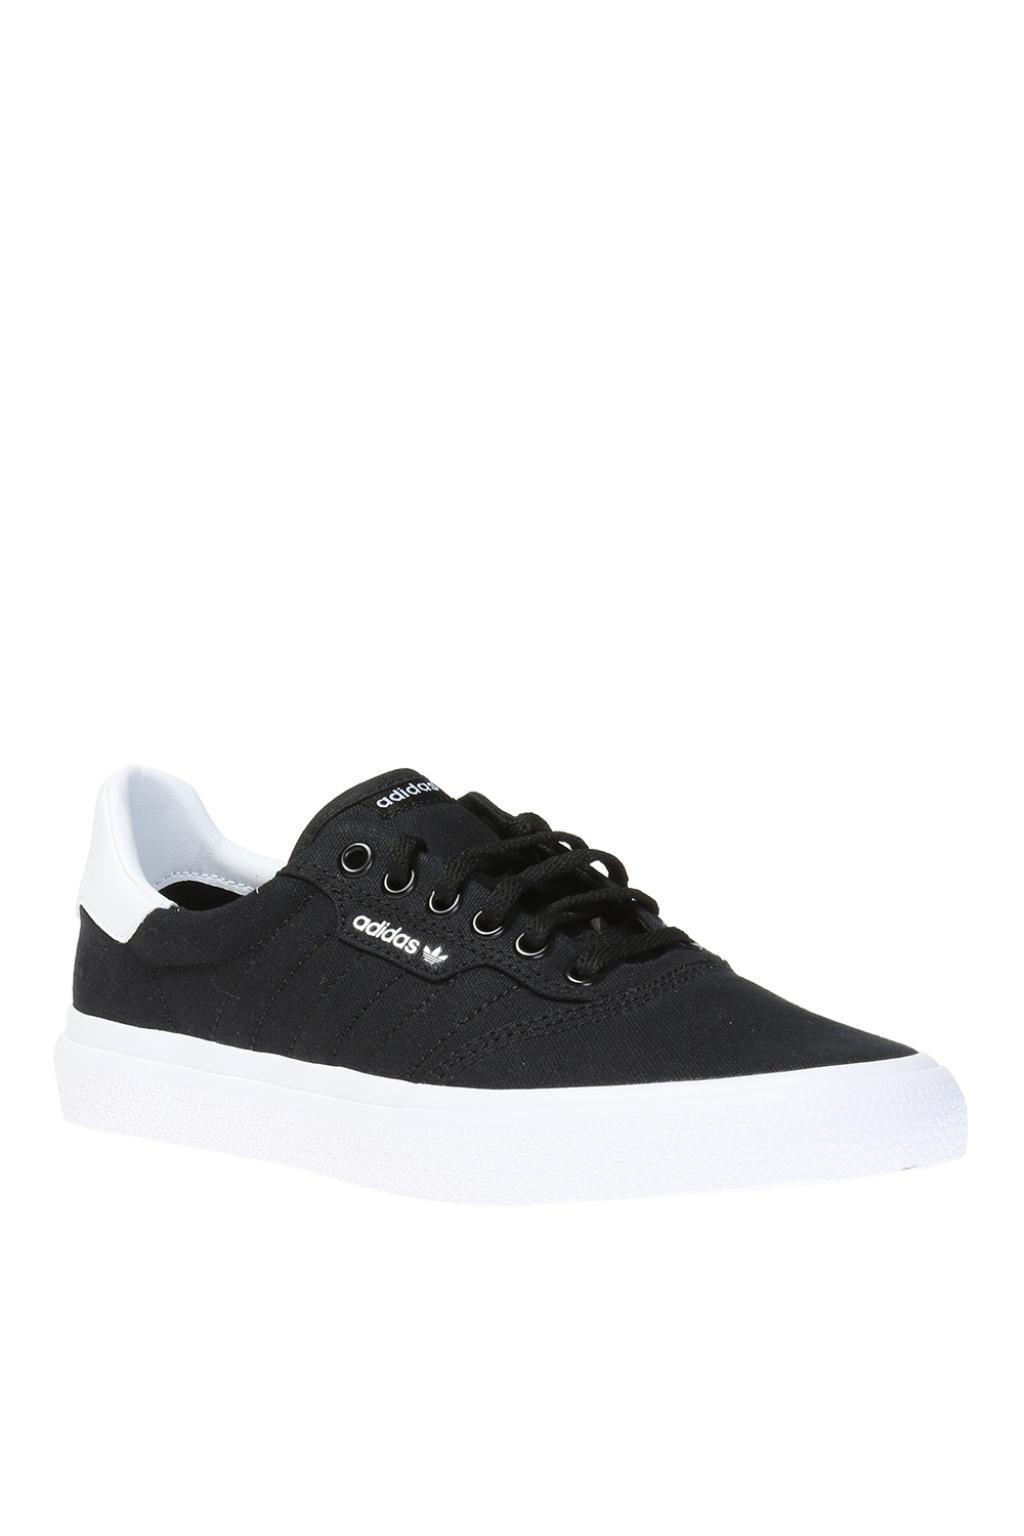 7bc5490ed1f0 Adidas Originals - Black  3mc Vulc  Sneakers for Men - Lyst. View fullscreen